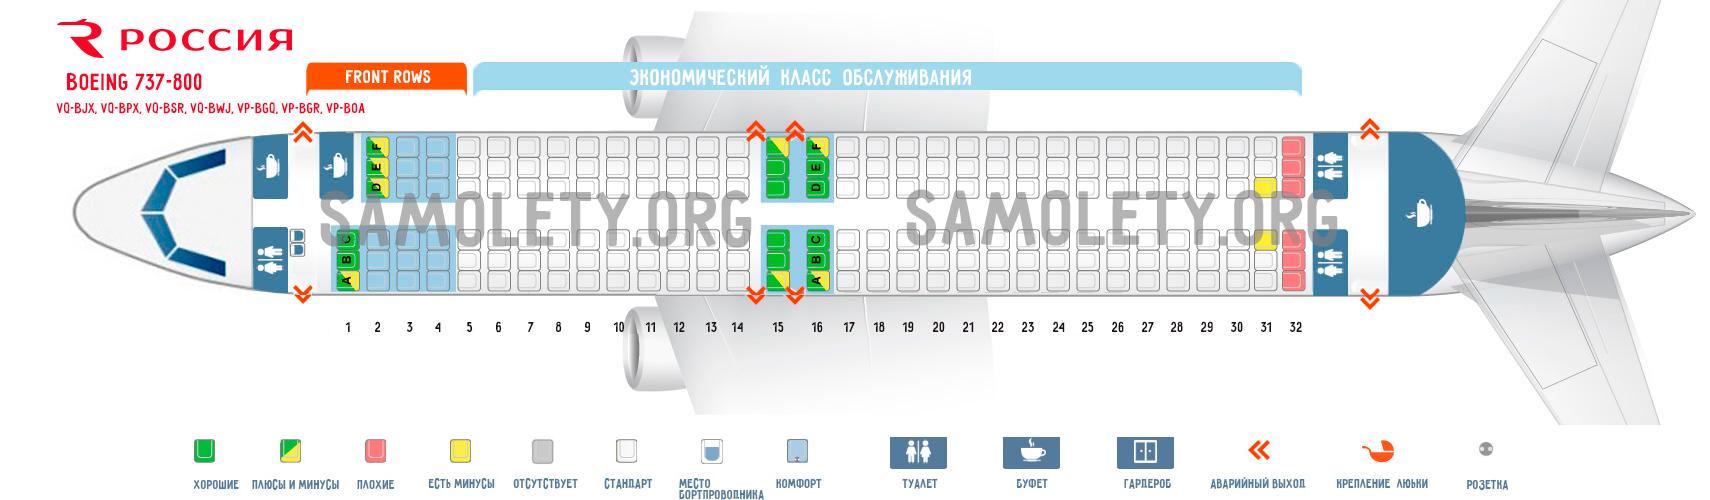 Боинг 737 800 схема салона лучшие места фото 901